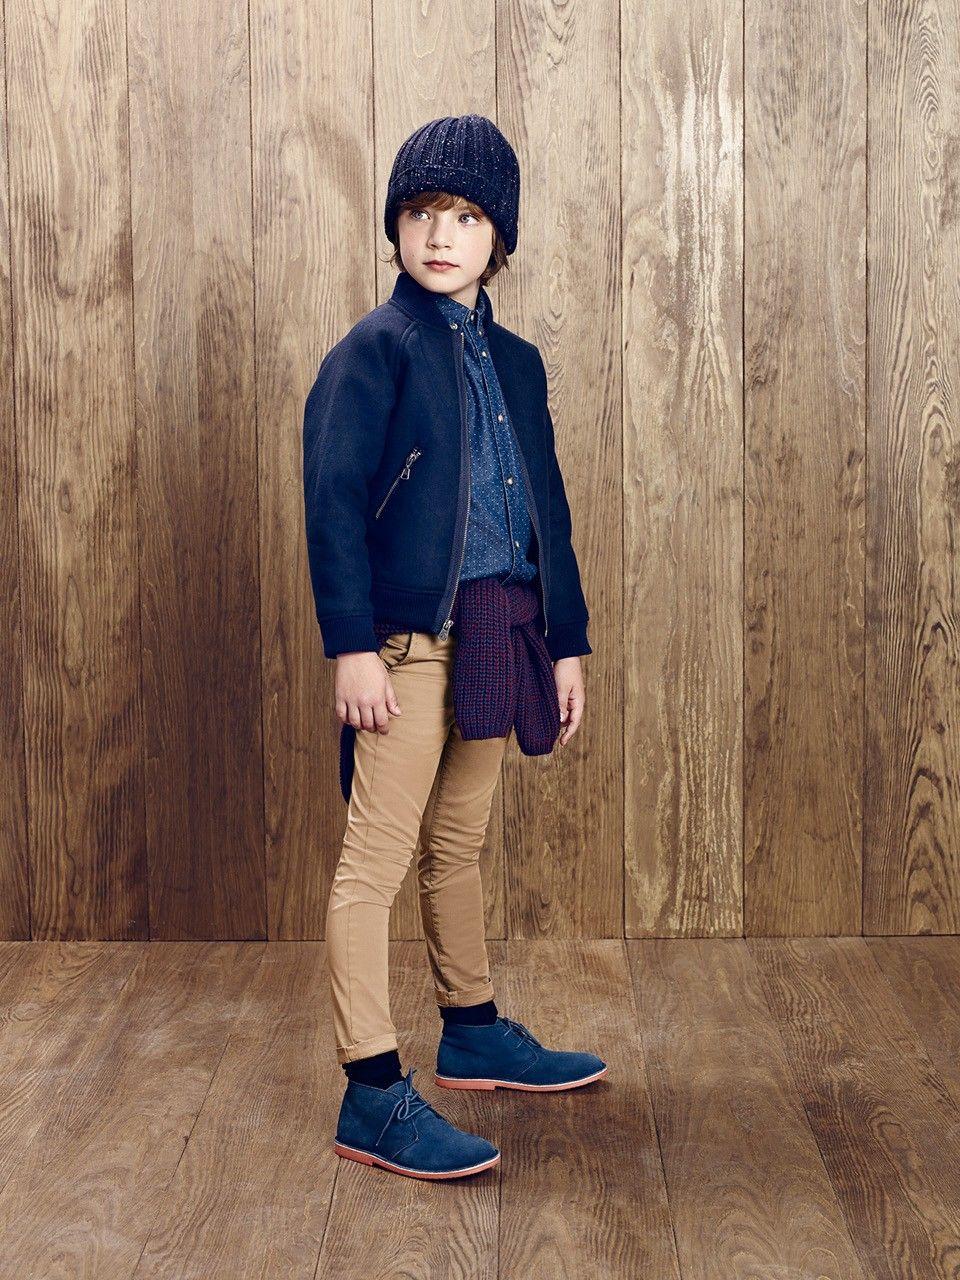 Niños catálogos kids fashion pinterest boy fashion lil boy